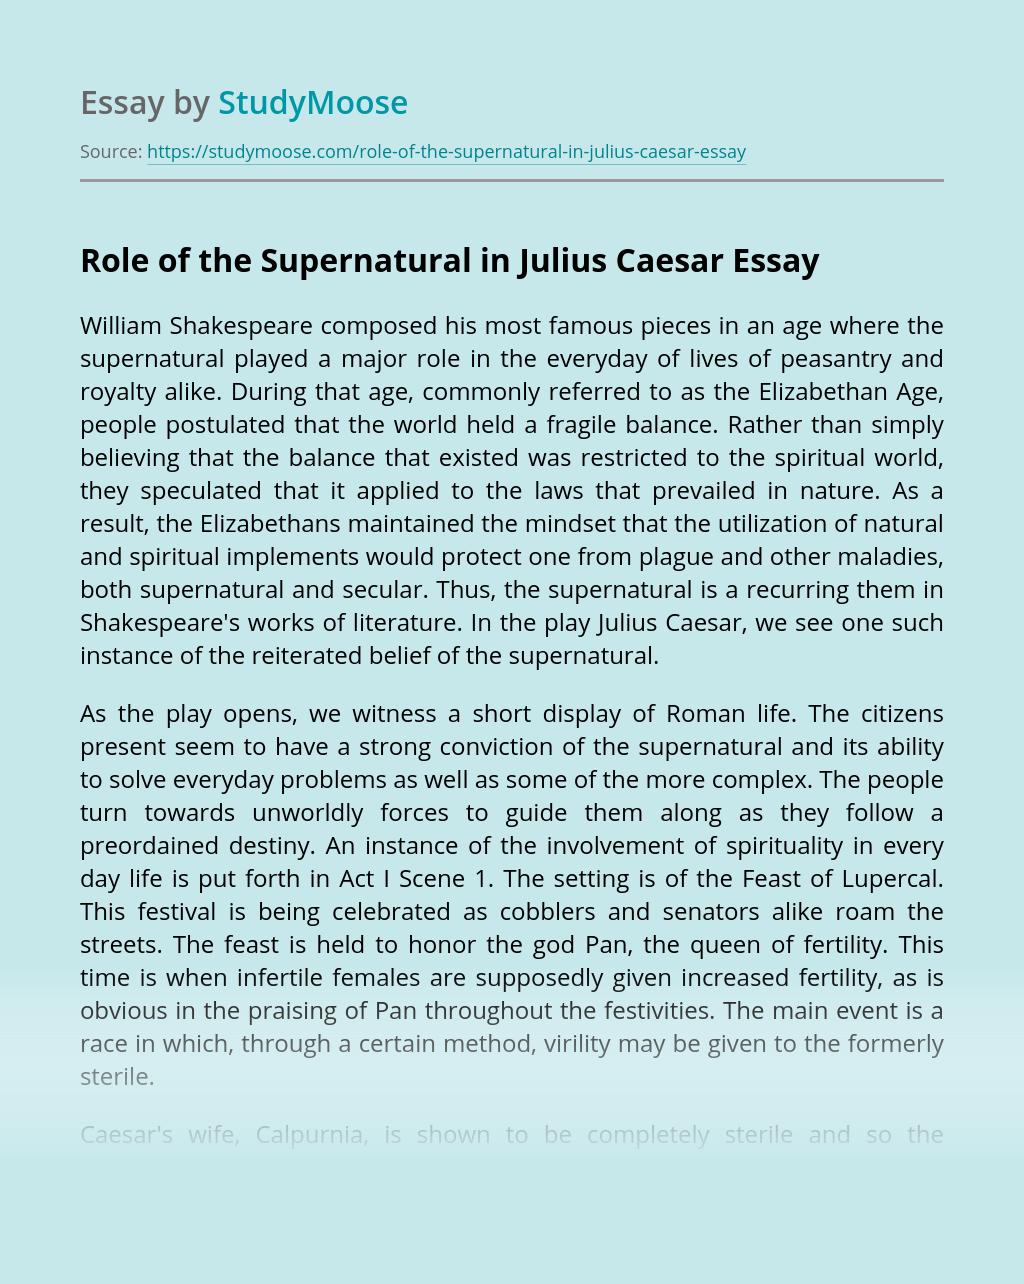 Role of the Supernatural in Julius Caesar